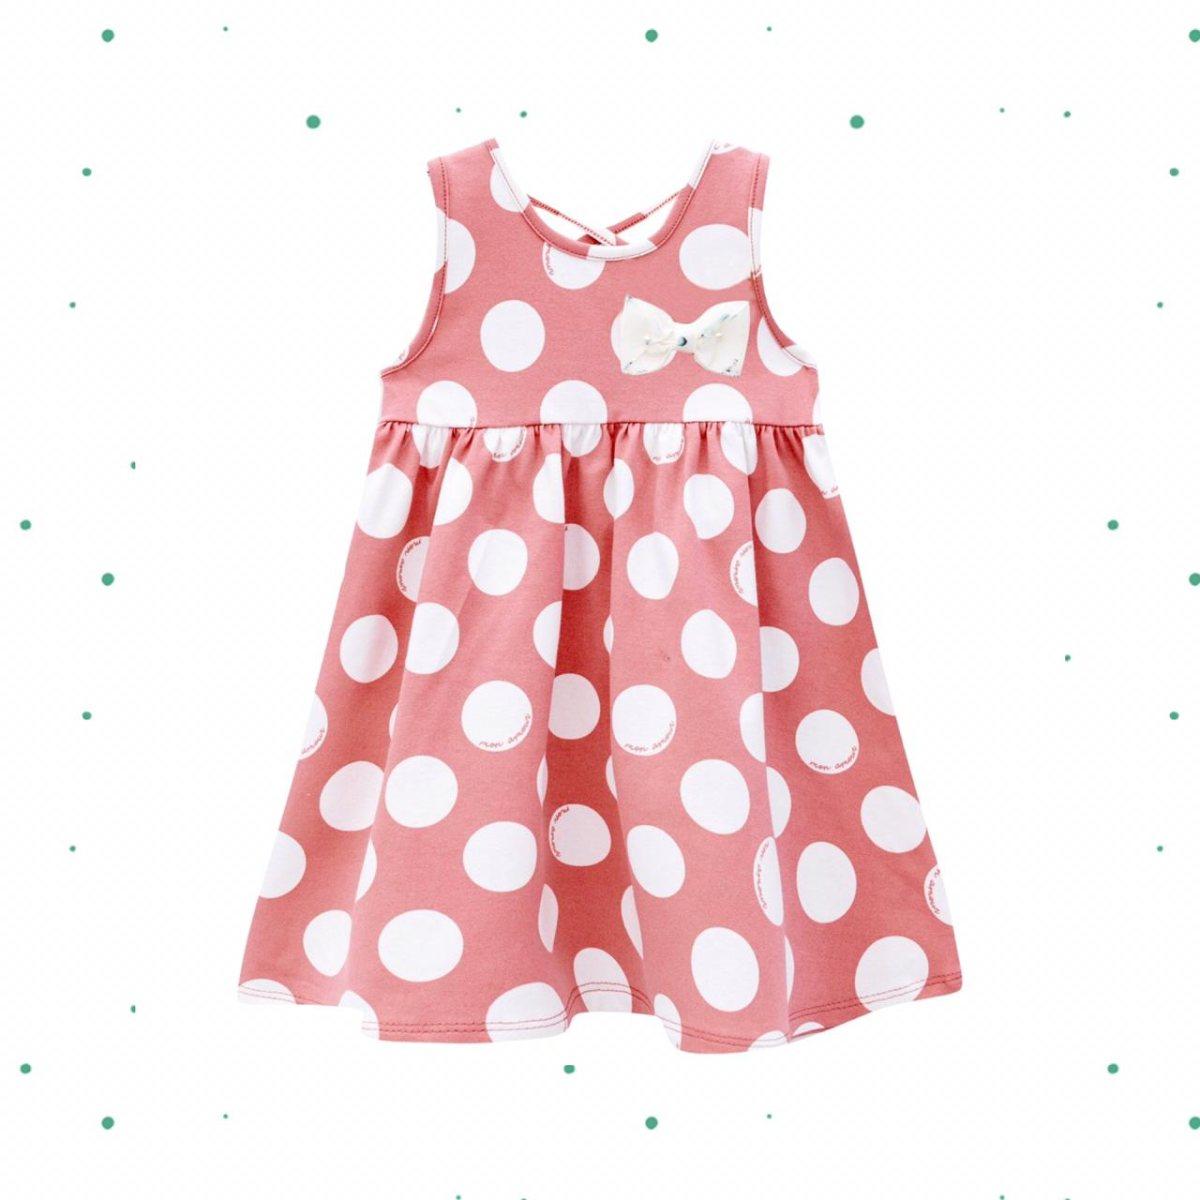 Vestido Infantil Milon em Cotton cor Rosa e Branco